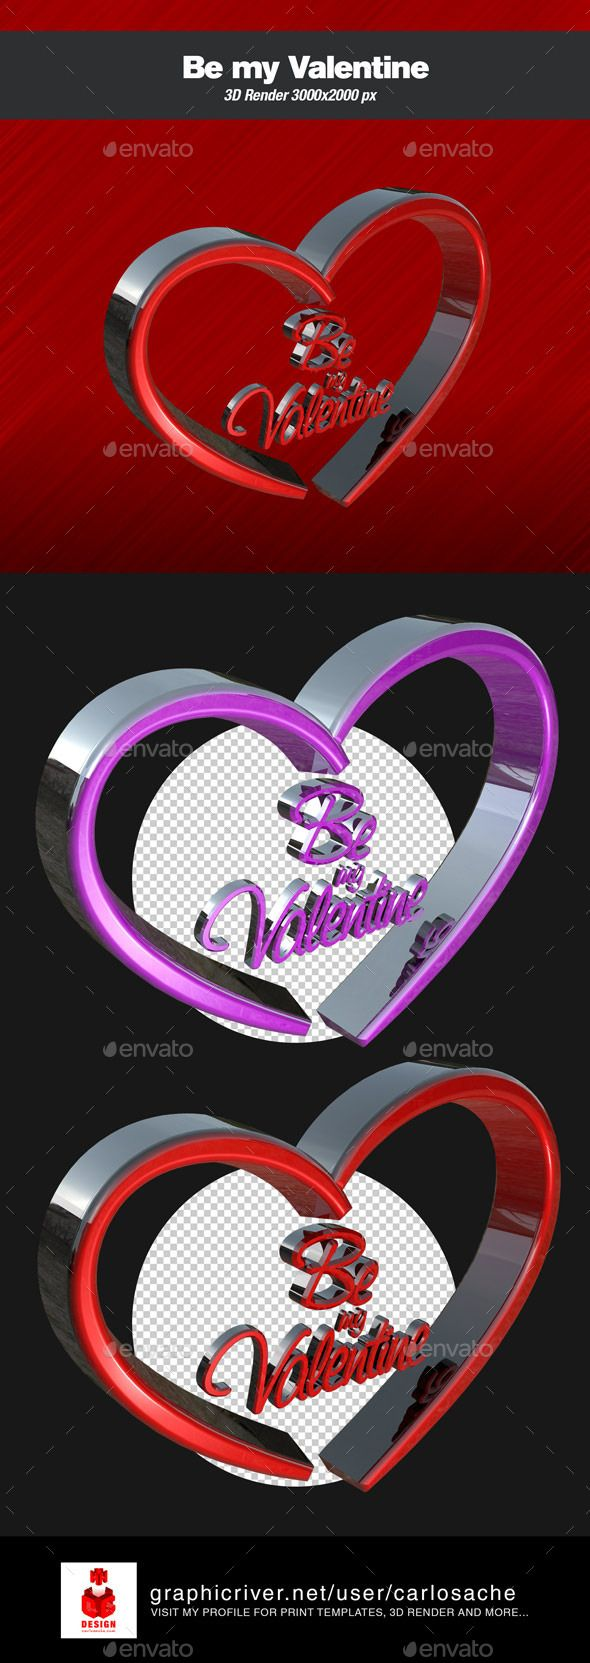 Be my Valentine - 3D Render Text